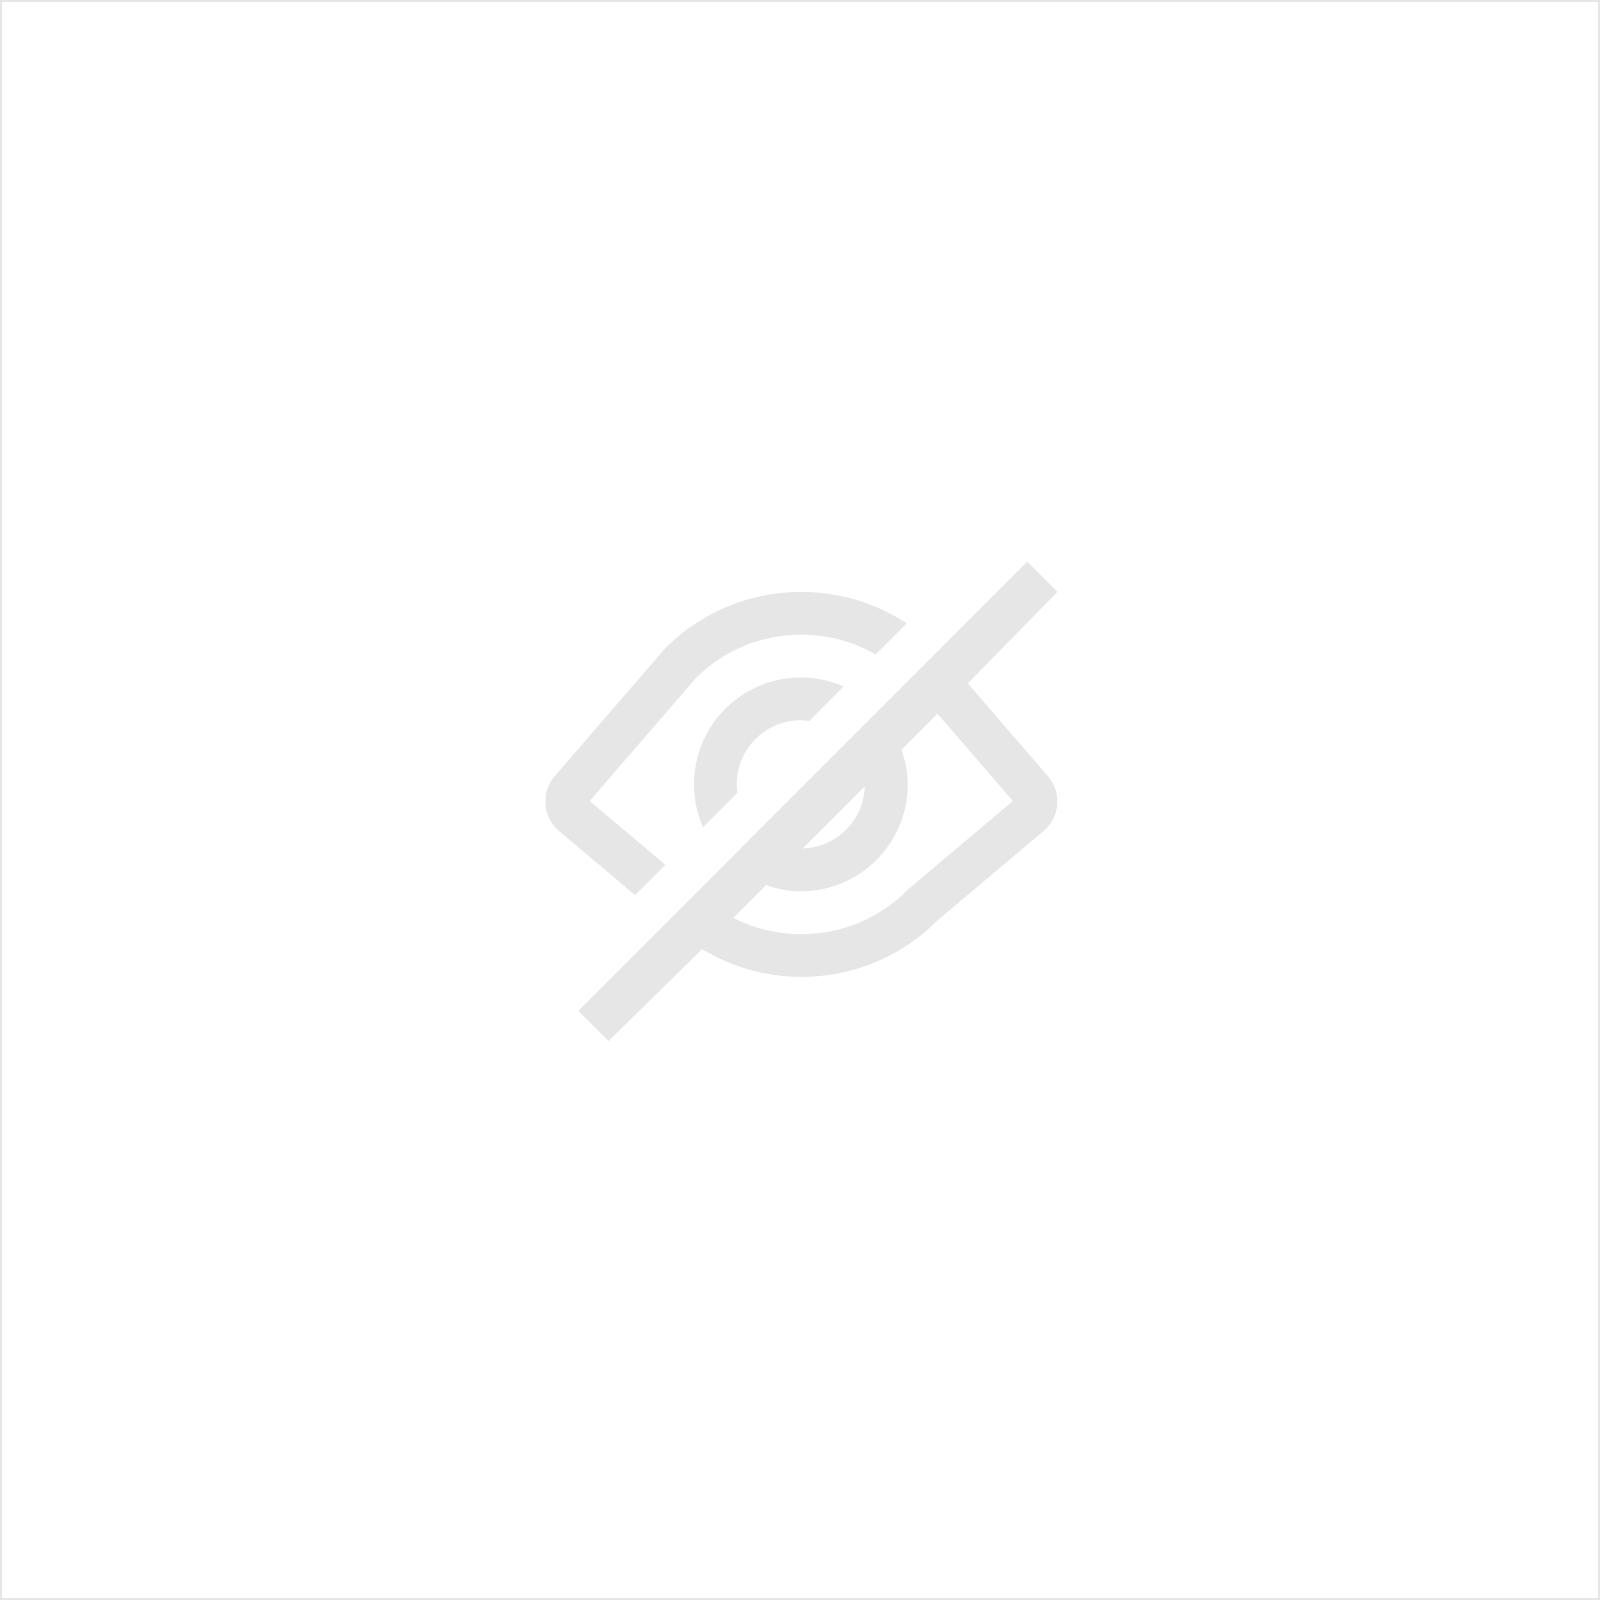 MEGUIAR'S PLASTX CLEAR PLASTIC CLEANER & POLISH (G12310)